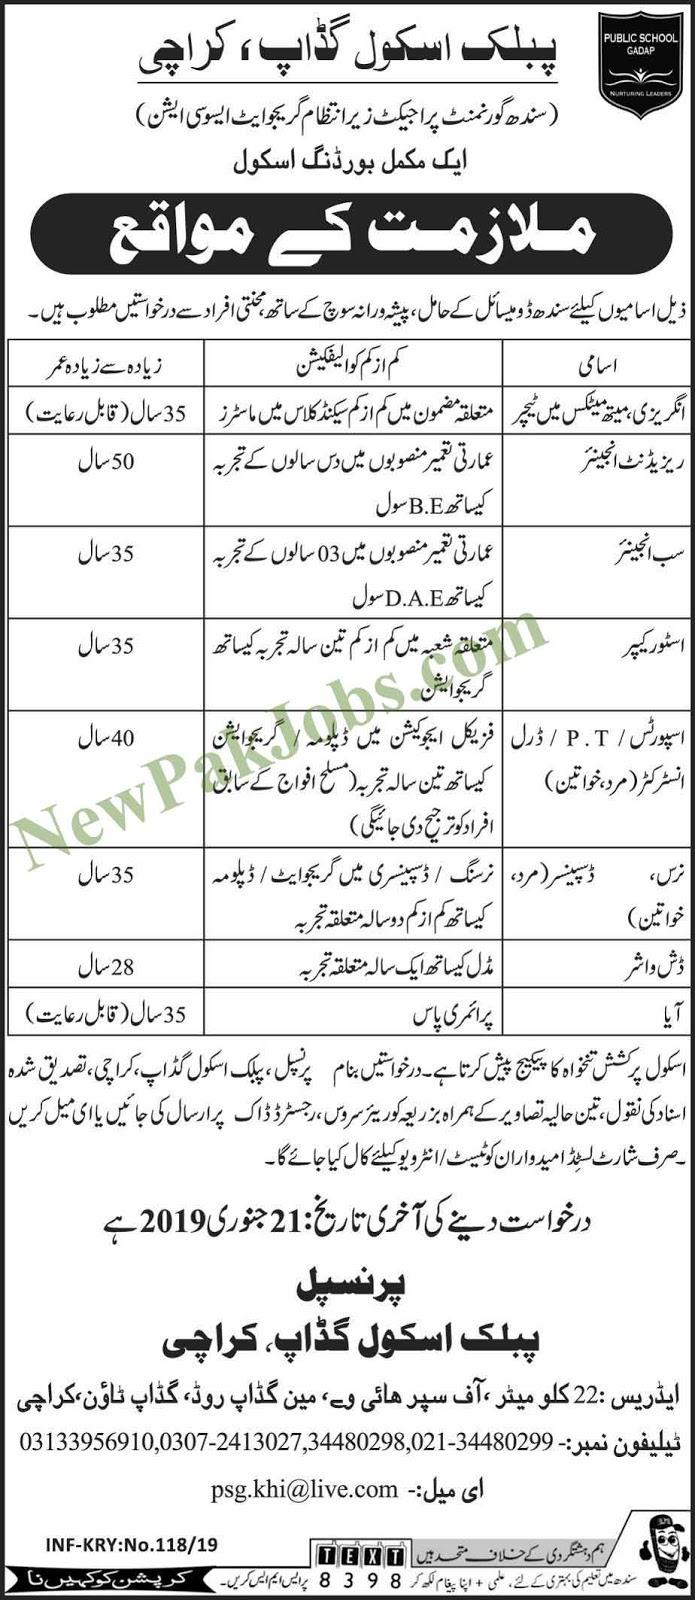 Gadap Karachi 11 Jan 2019